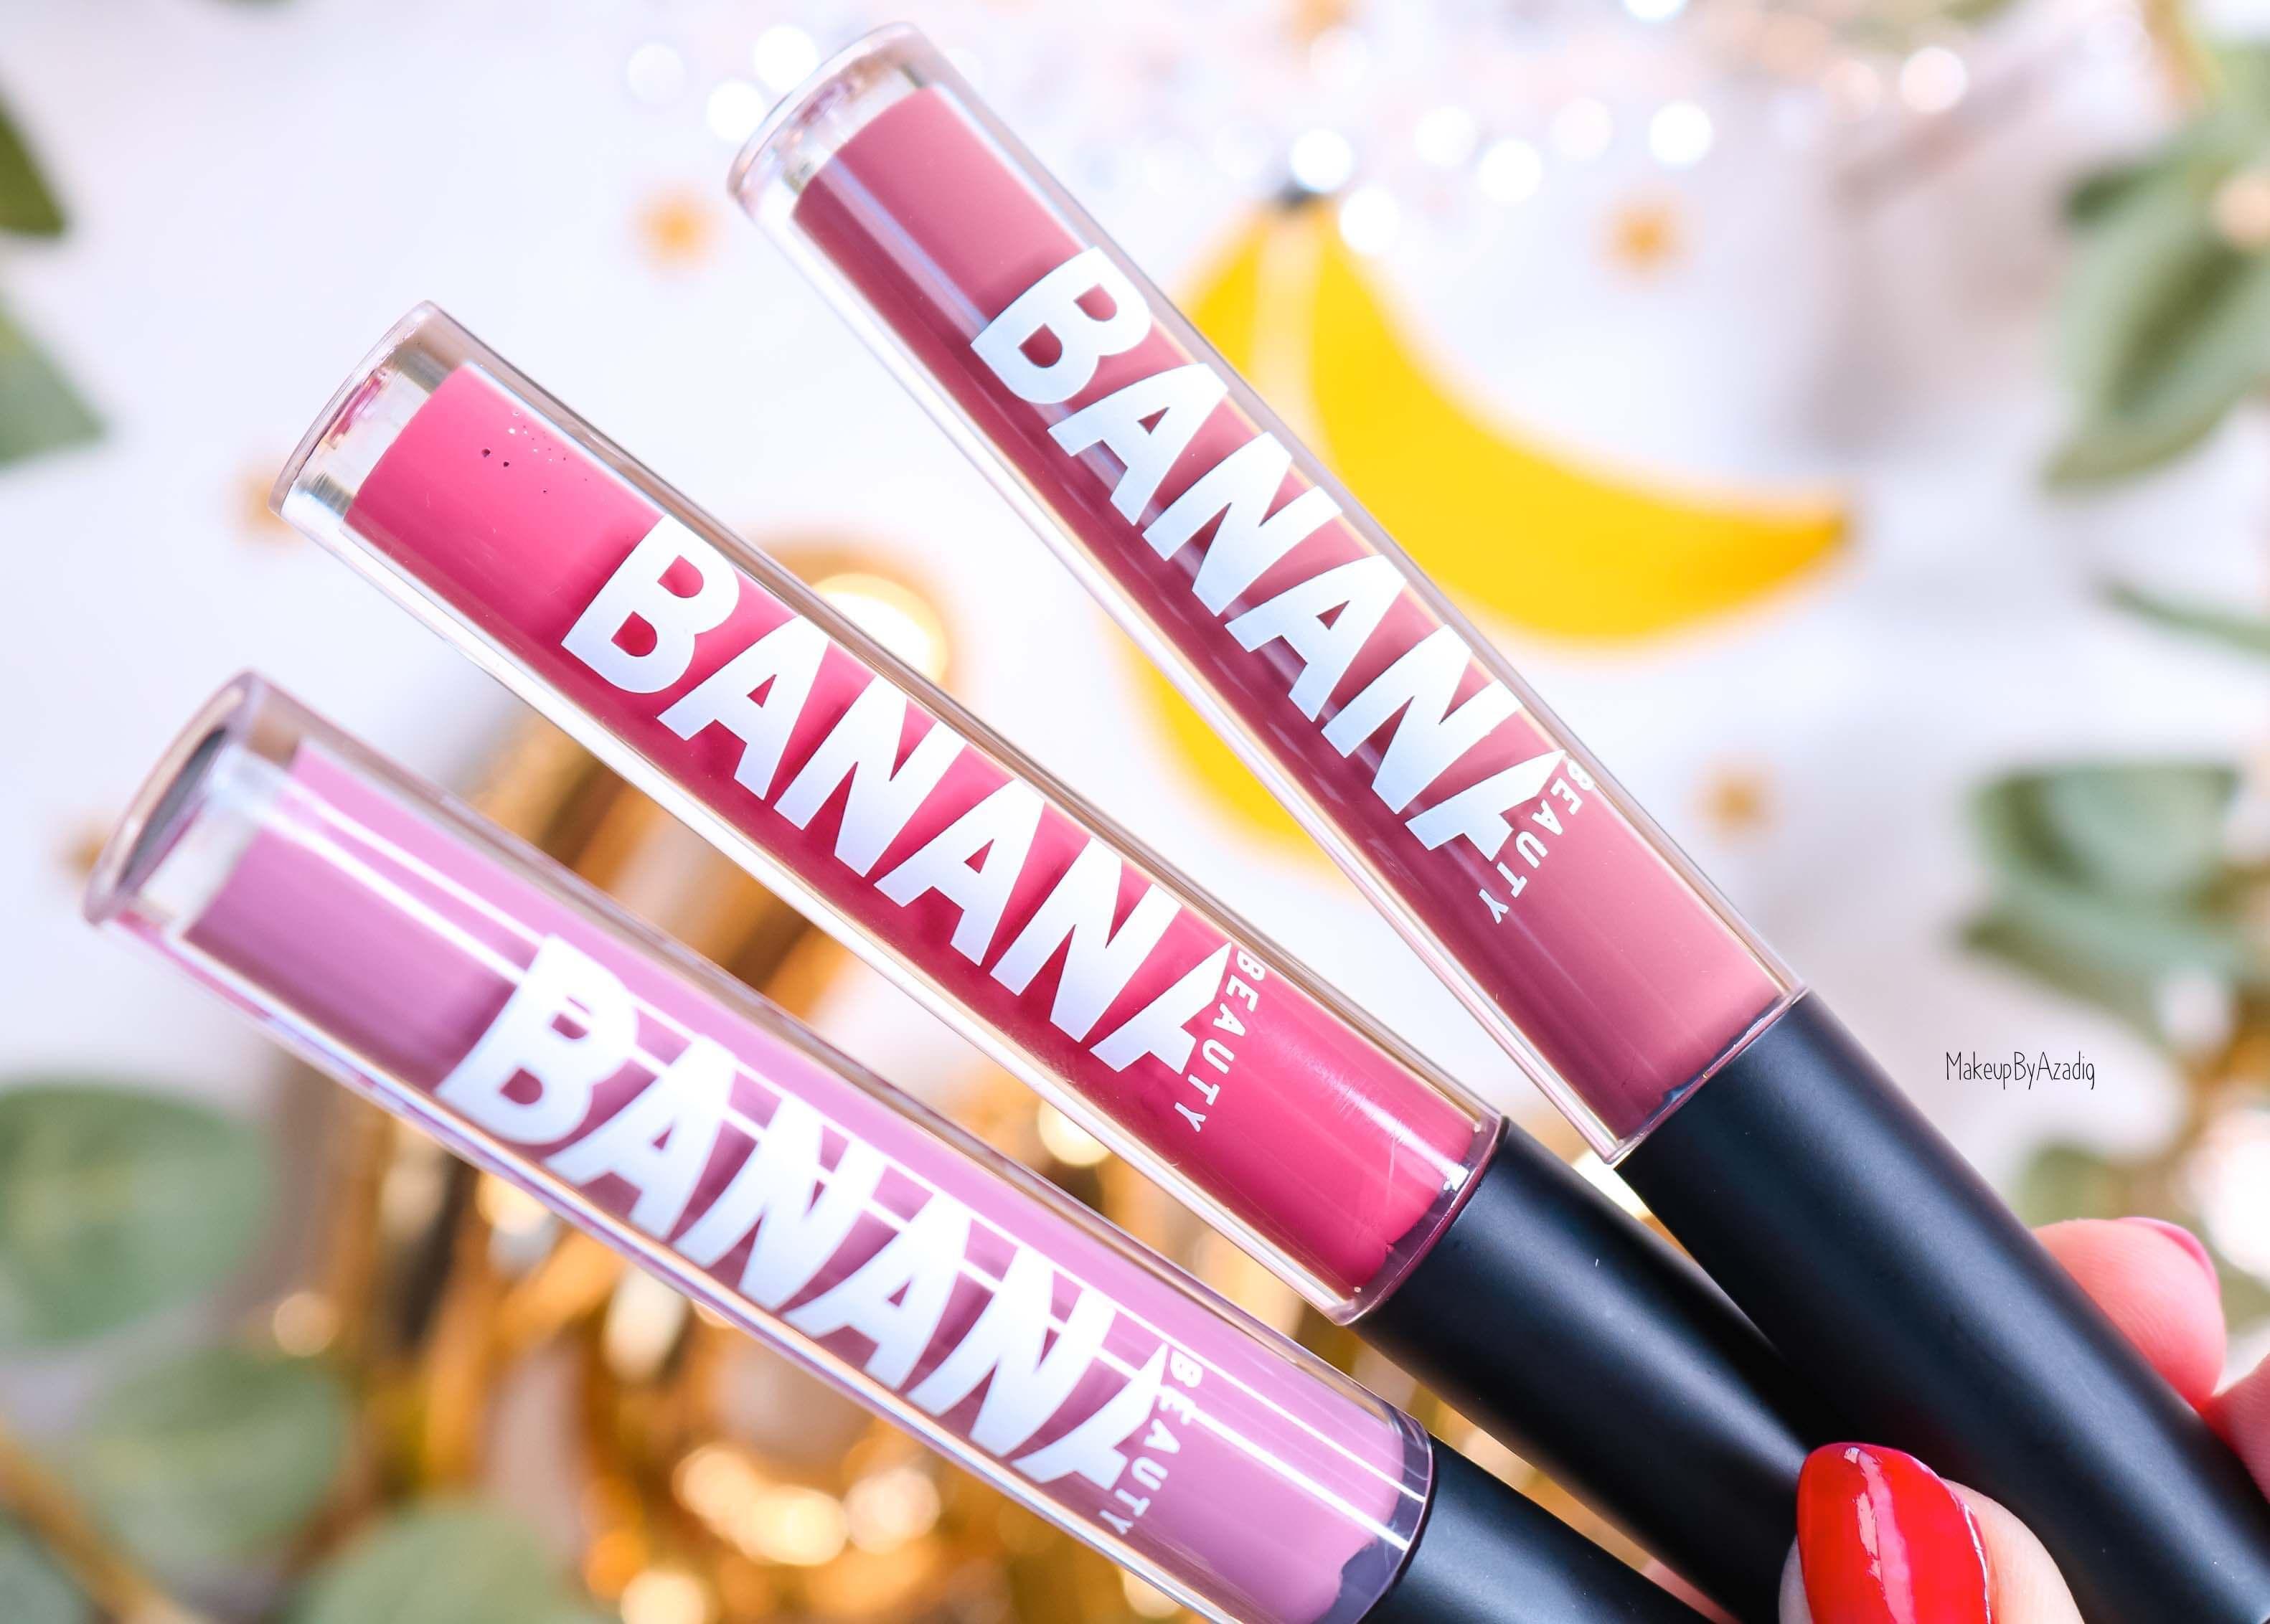 revue-rouge-a-levres-lipstick-banana-beauty-avis-prix-swatch-partenariat-ohlalicious-lady-licious-heels-up-makeupbyazadig-nude-collector-code-promo-zoom